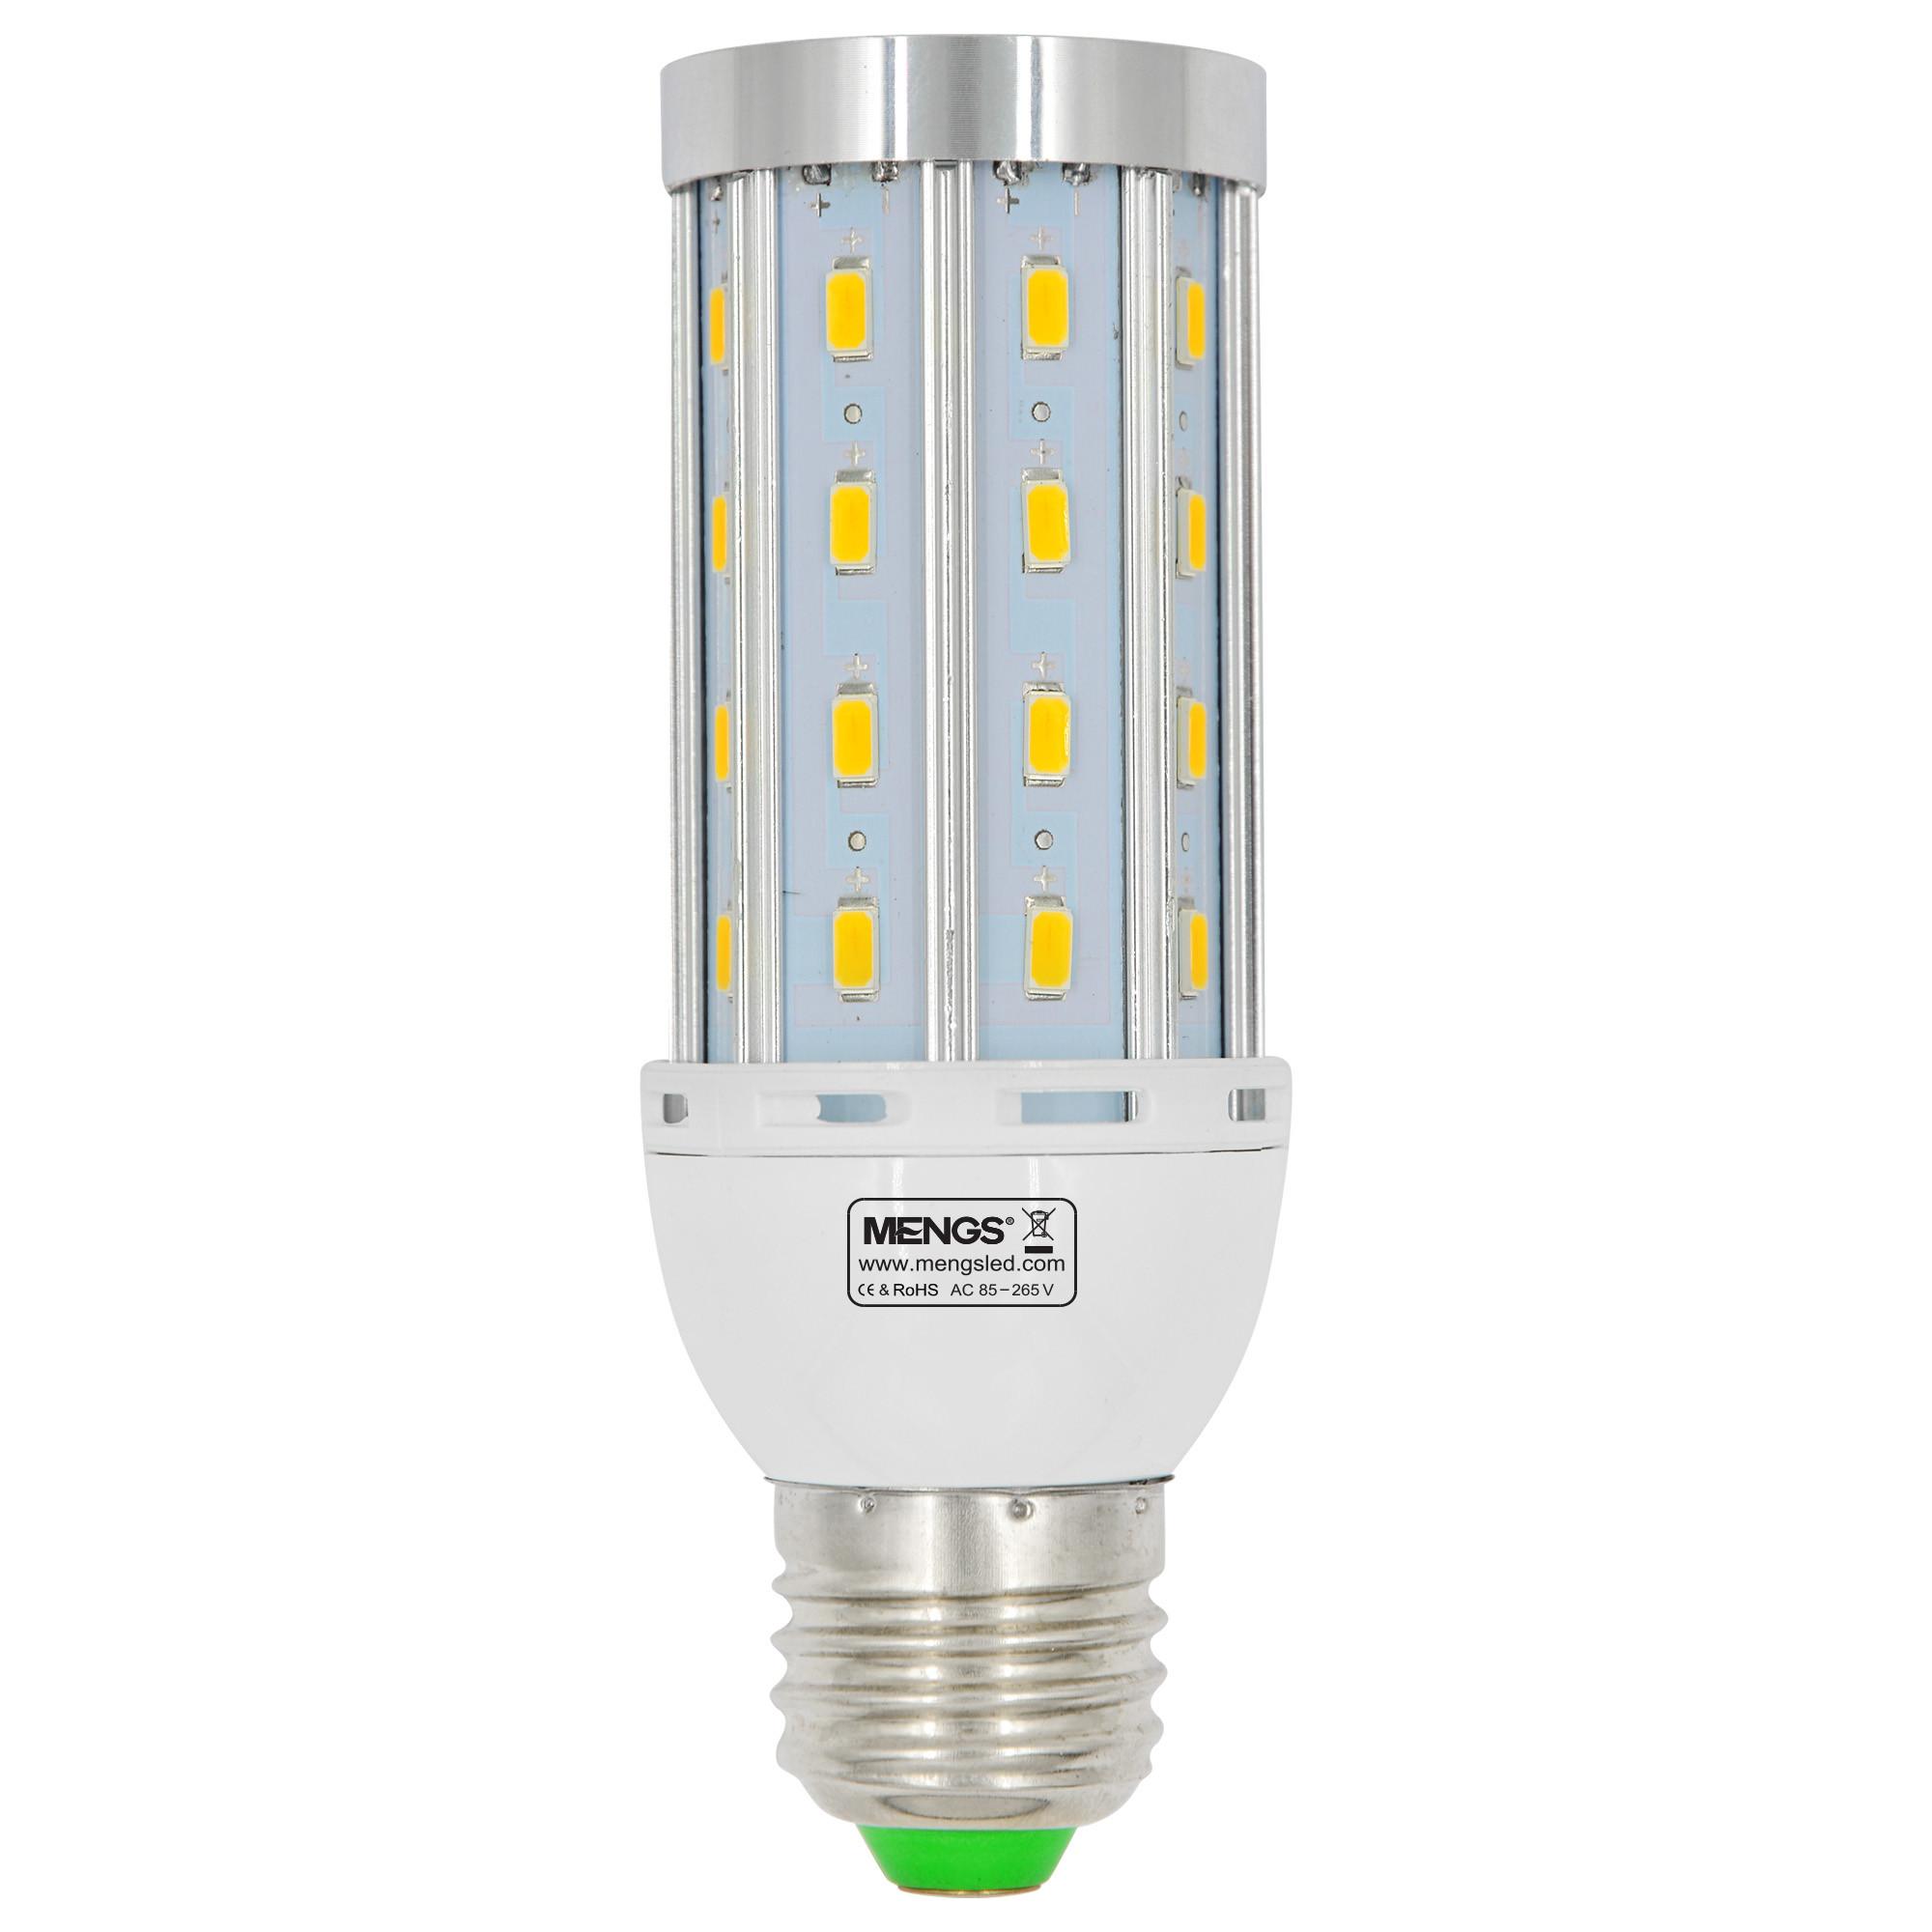 MENGS® Anti-Strobe E27 12W LED Corn Light 40x 5730 SMD LED Bulb Lamp With Aluminum Plate AC 85-265V In Warm White Energy-Saving Lamp